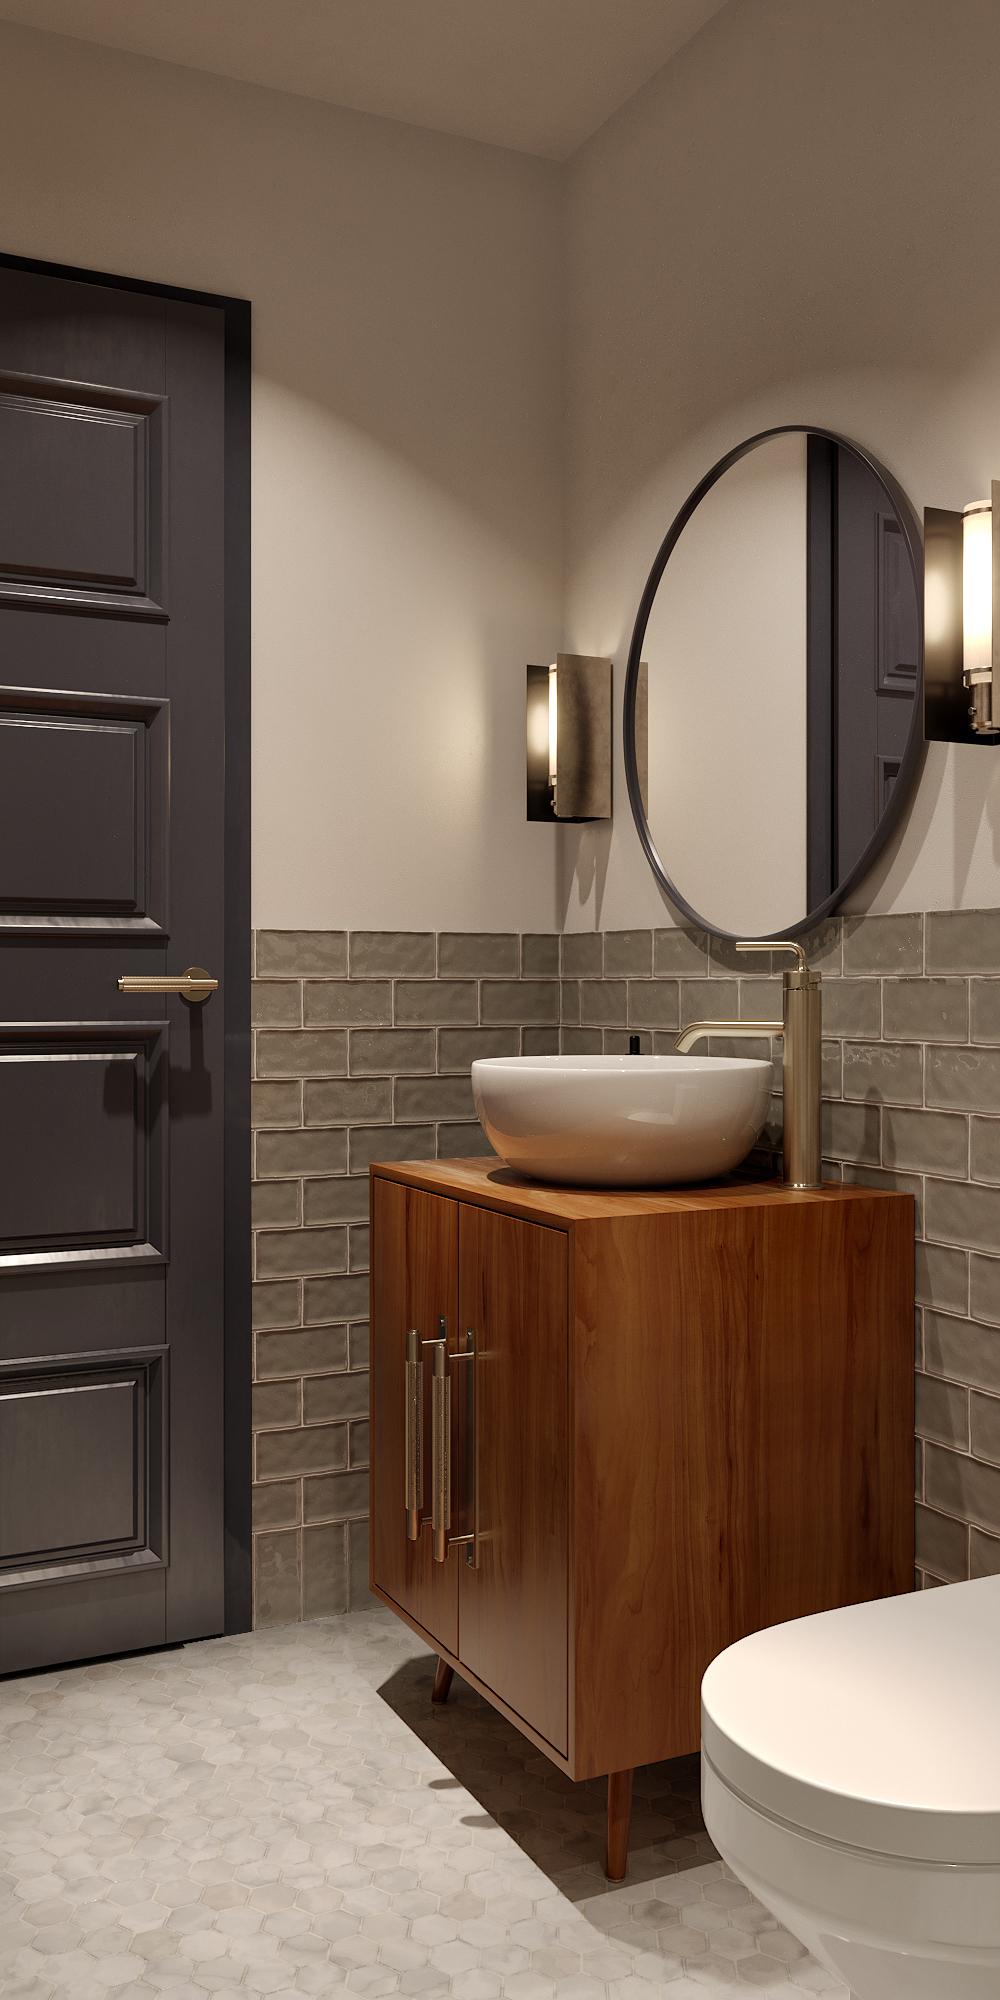 Bathroom in Mala Strana